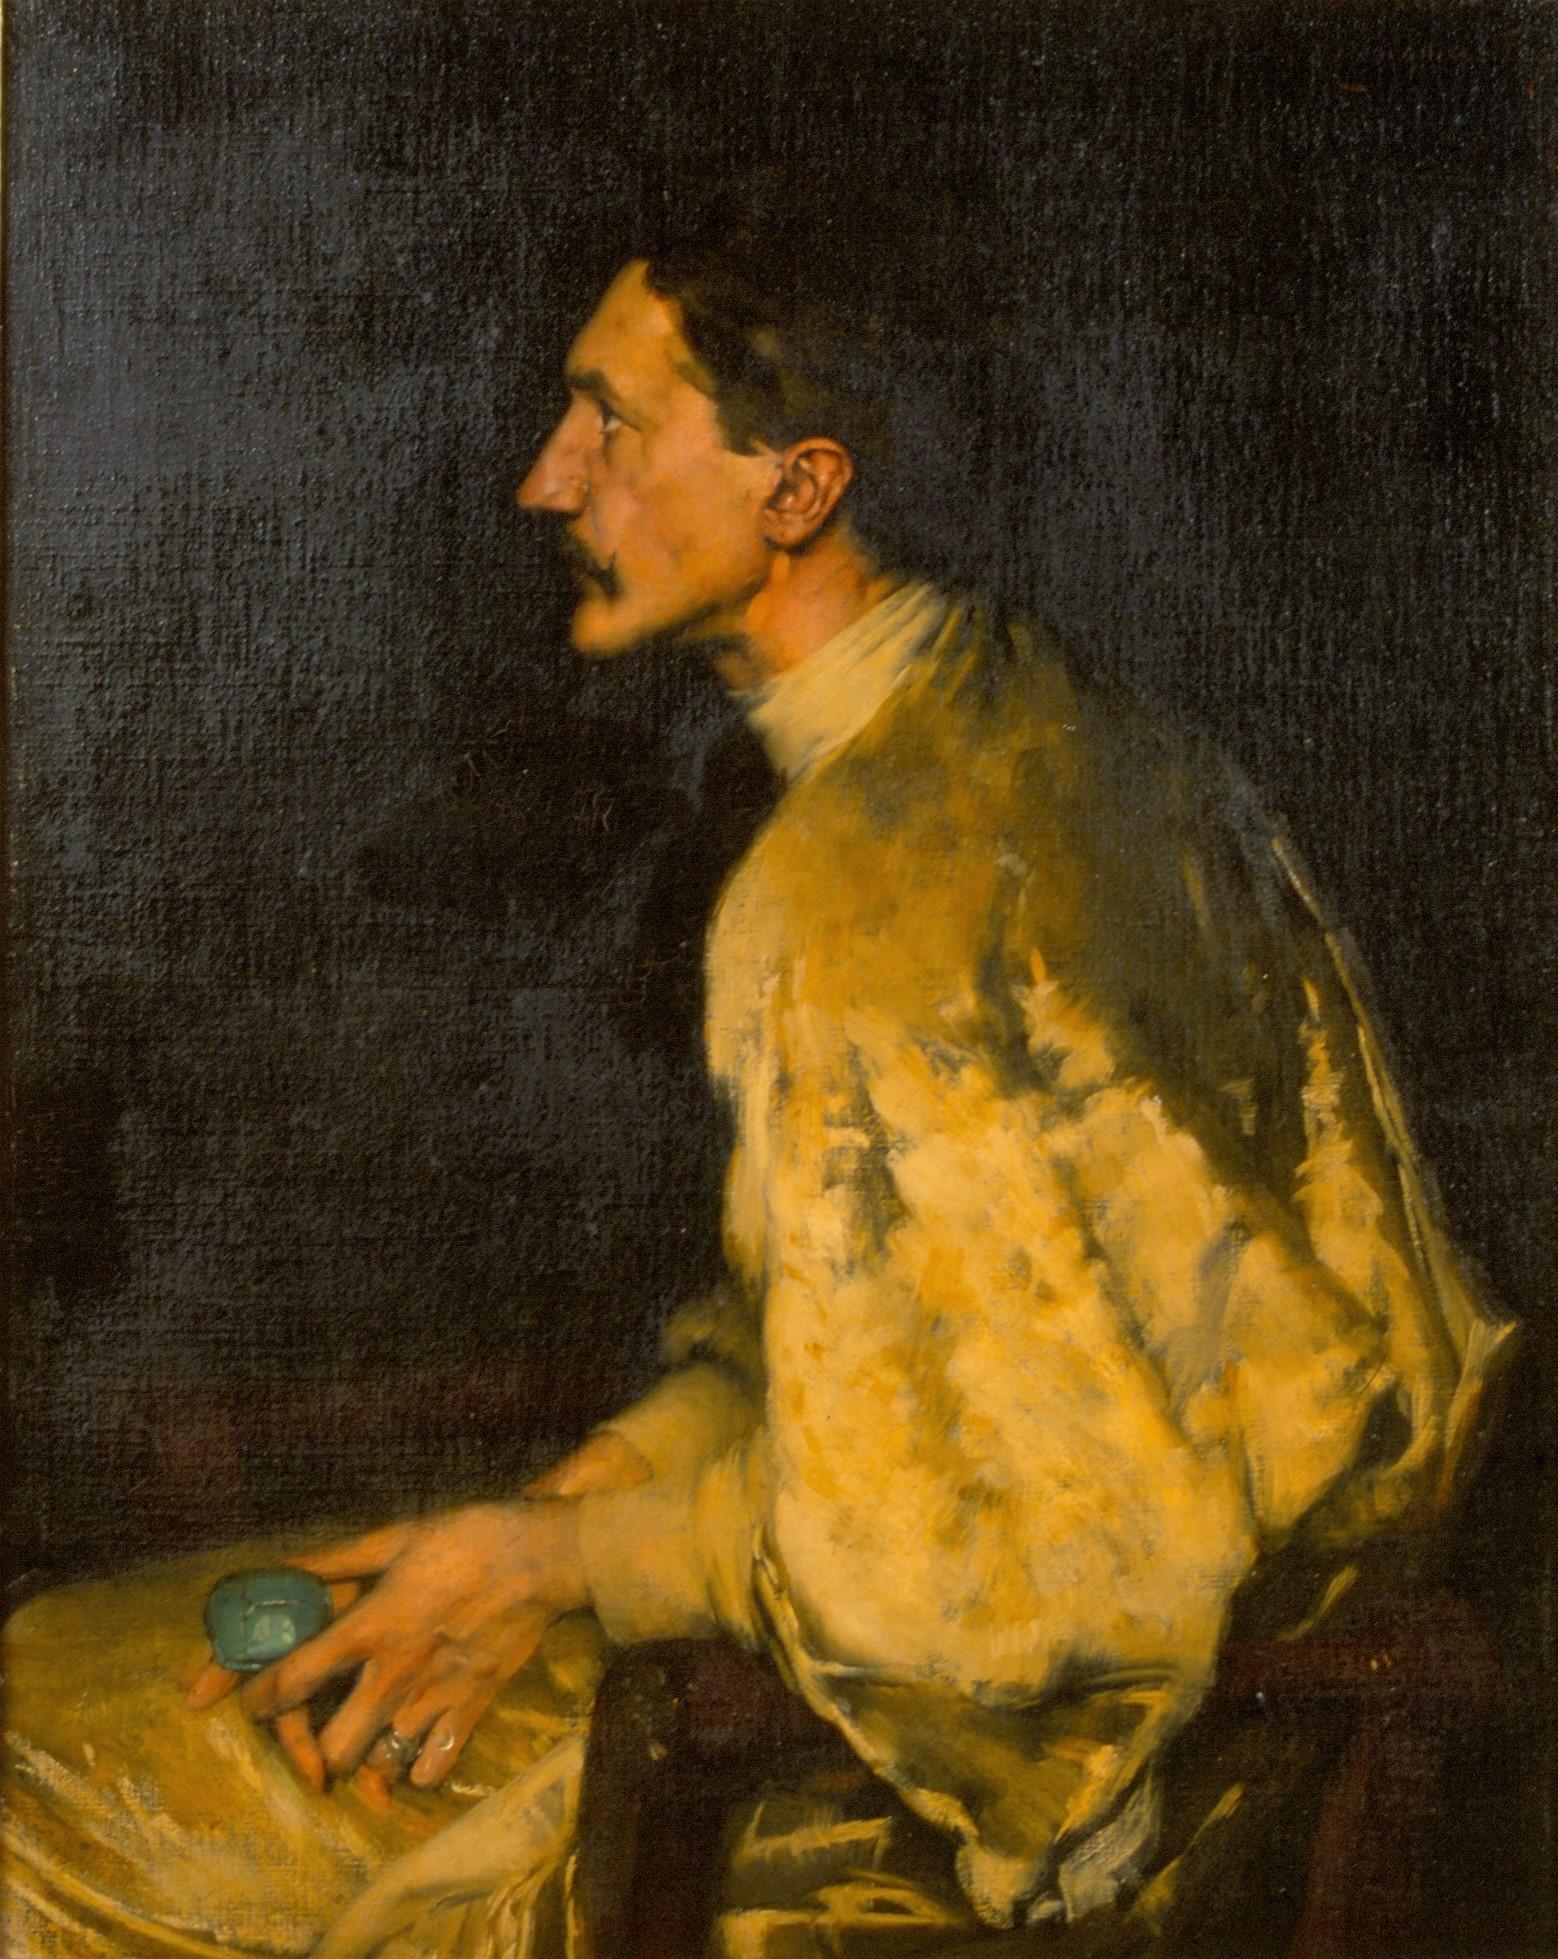 94.Robert de Montesquiou AF 76 La Gandara0001